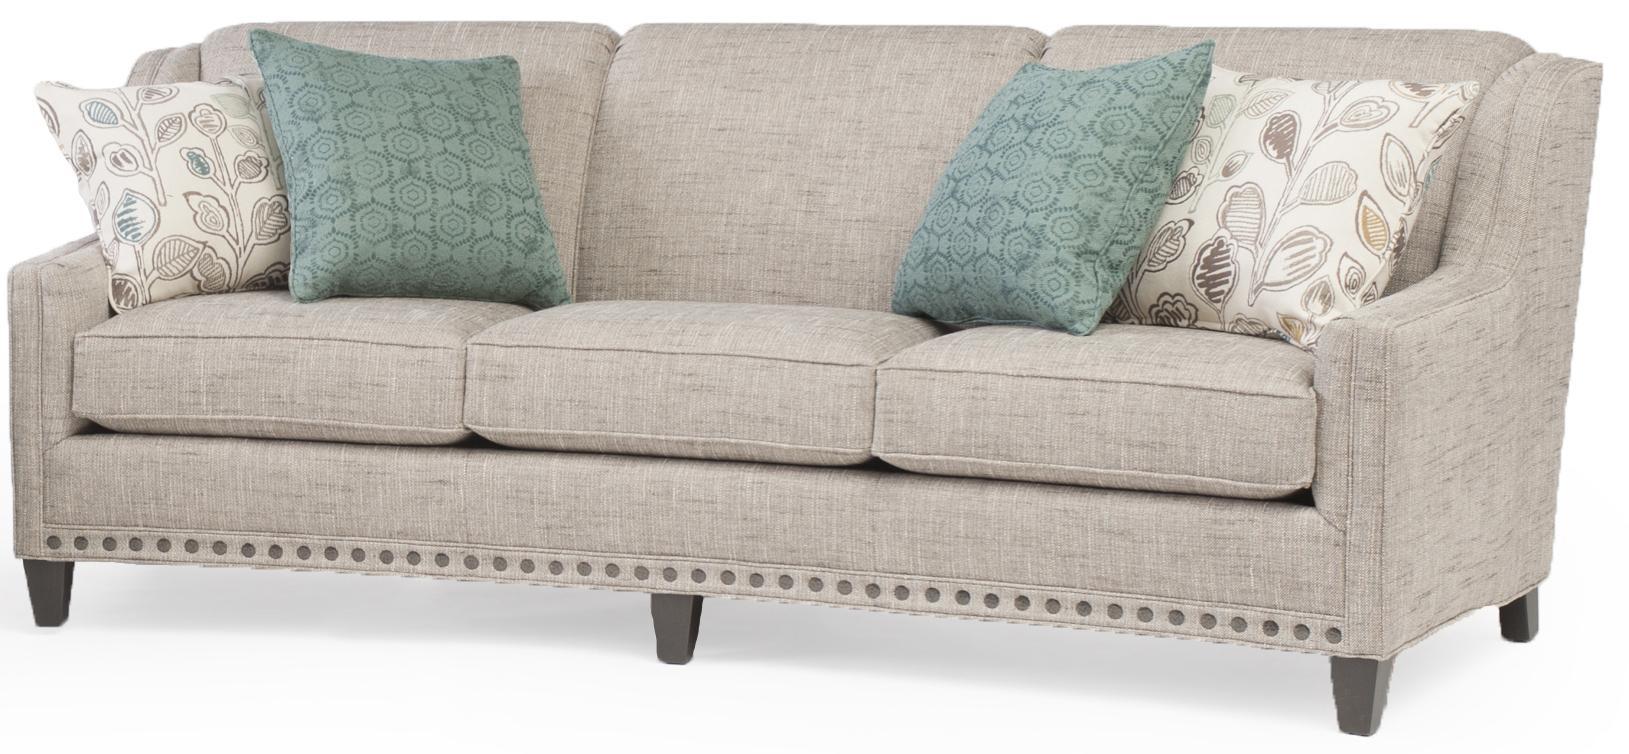 Genial Smith Brothers 227Stationary Sofa; Smith Brothers 227Stationary Sofa ...